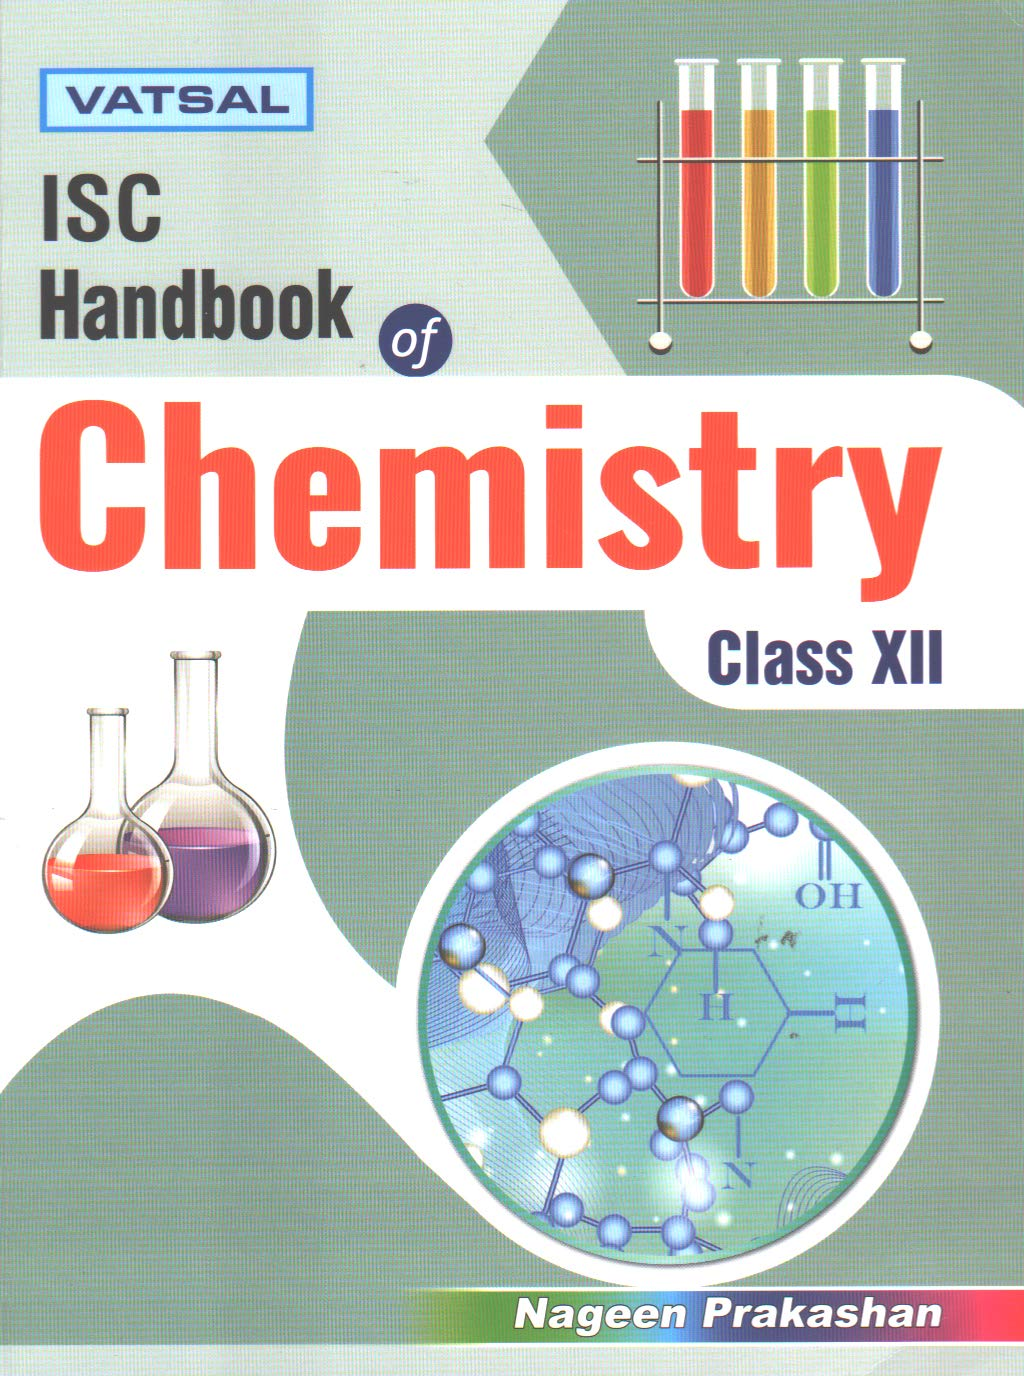 Vatsal ISC Handbook of Chemistry Class 12